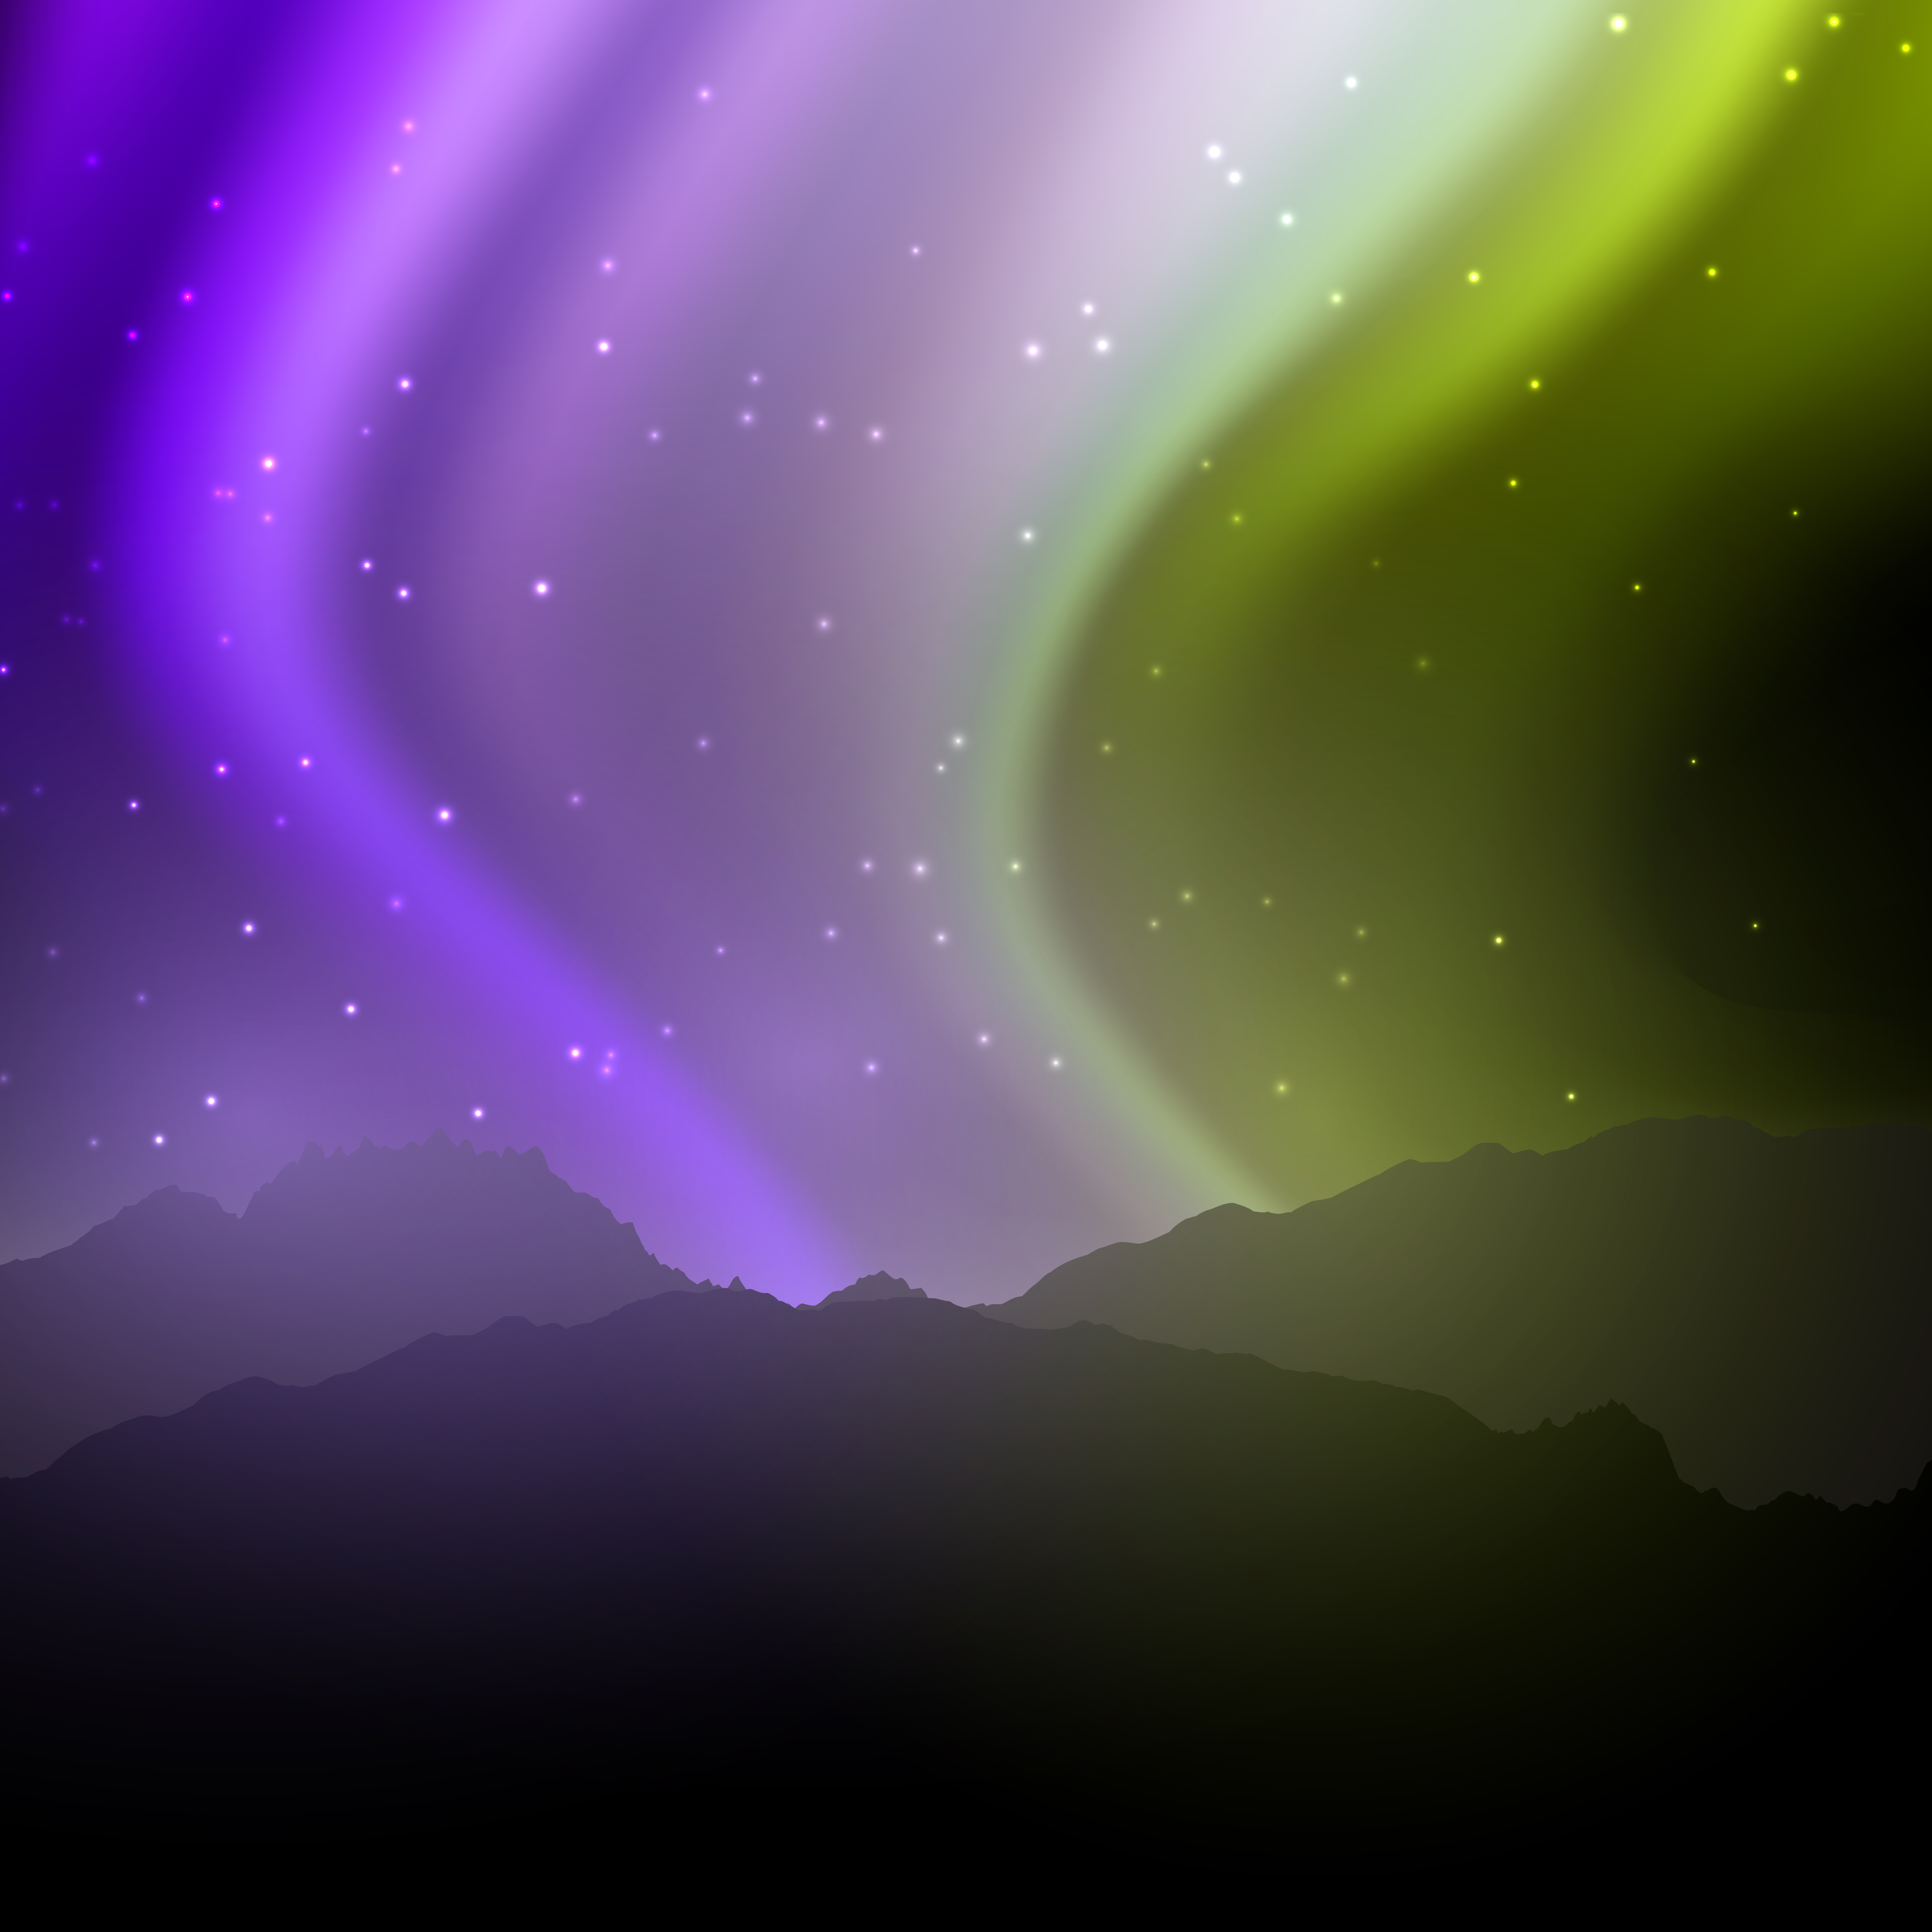 Aurora boreal clipart transparent download Aurora Borealis Clipart night sky 13 - 5000 X 5000 Free Clip Art ... transparent download